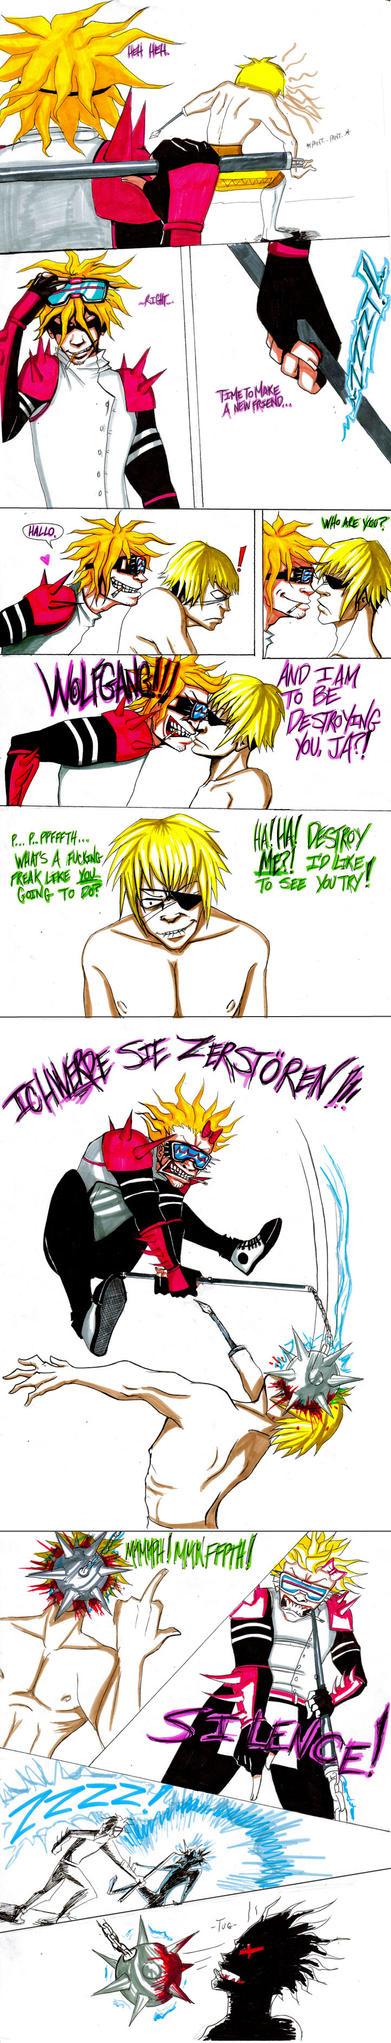 Wolfgang vs. The Matadorion by TadashiChizoko